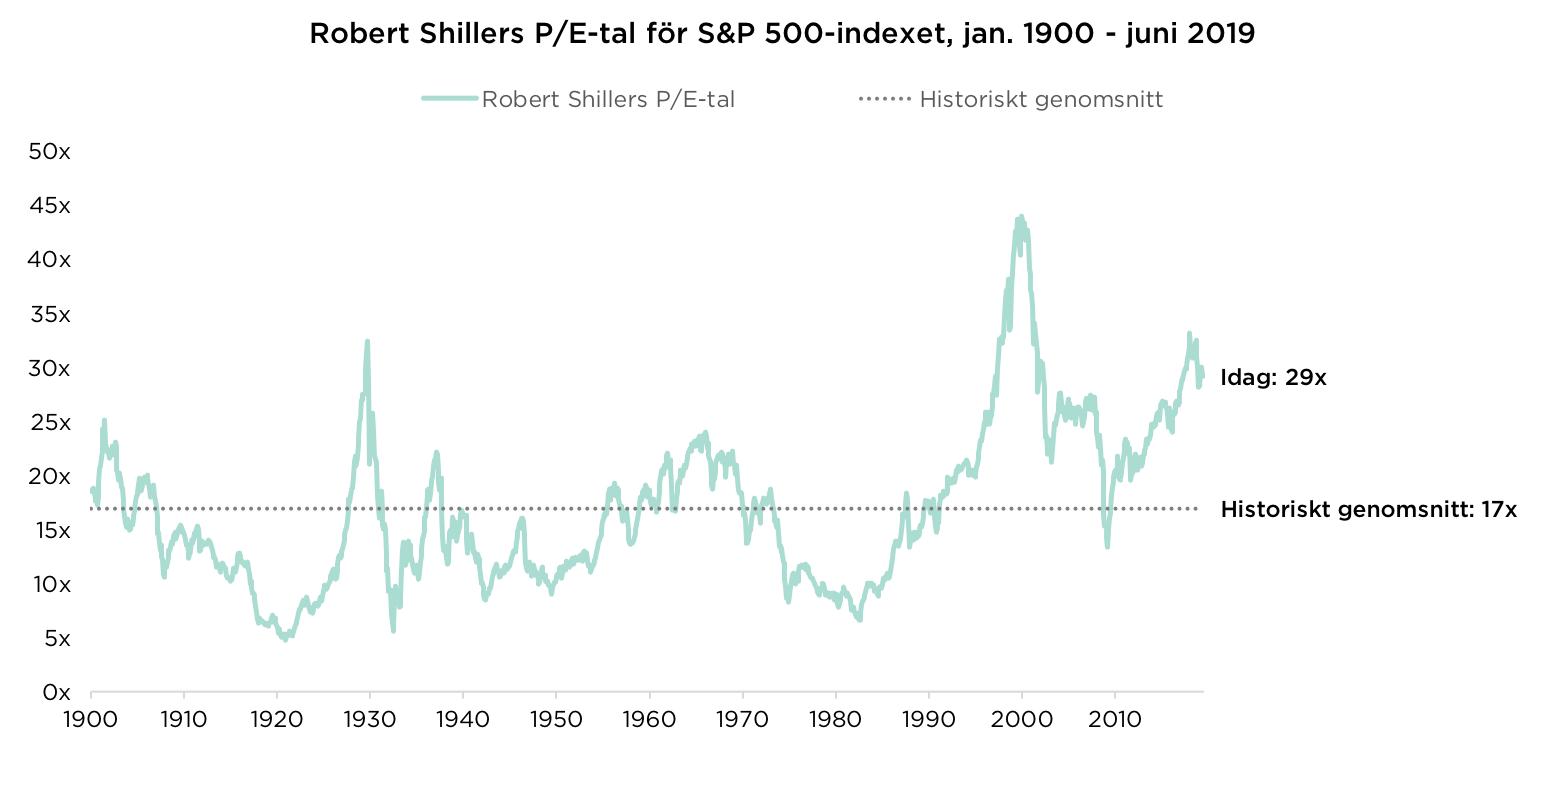 Robert Shillers P/E-tal för S&P 500-indexet, jan. 1900 – juni 2019